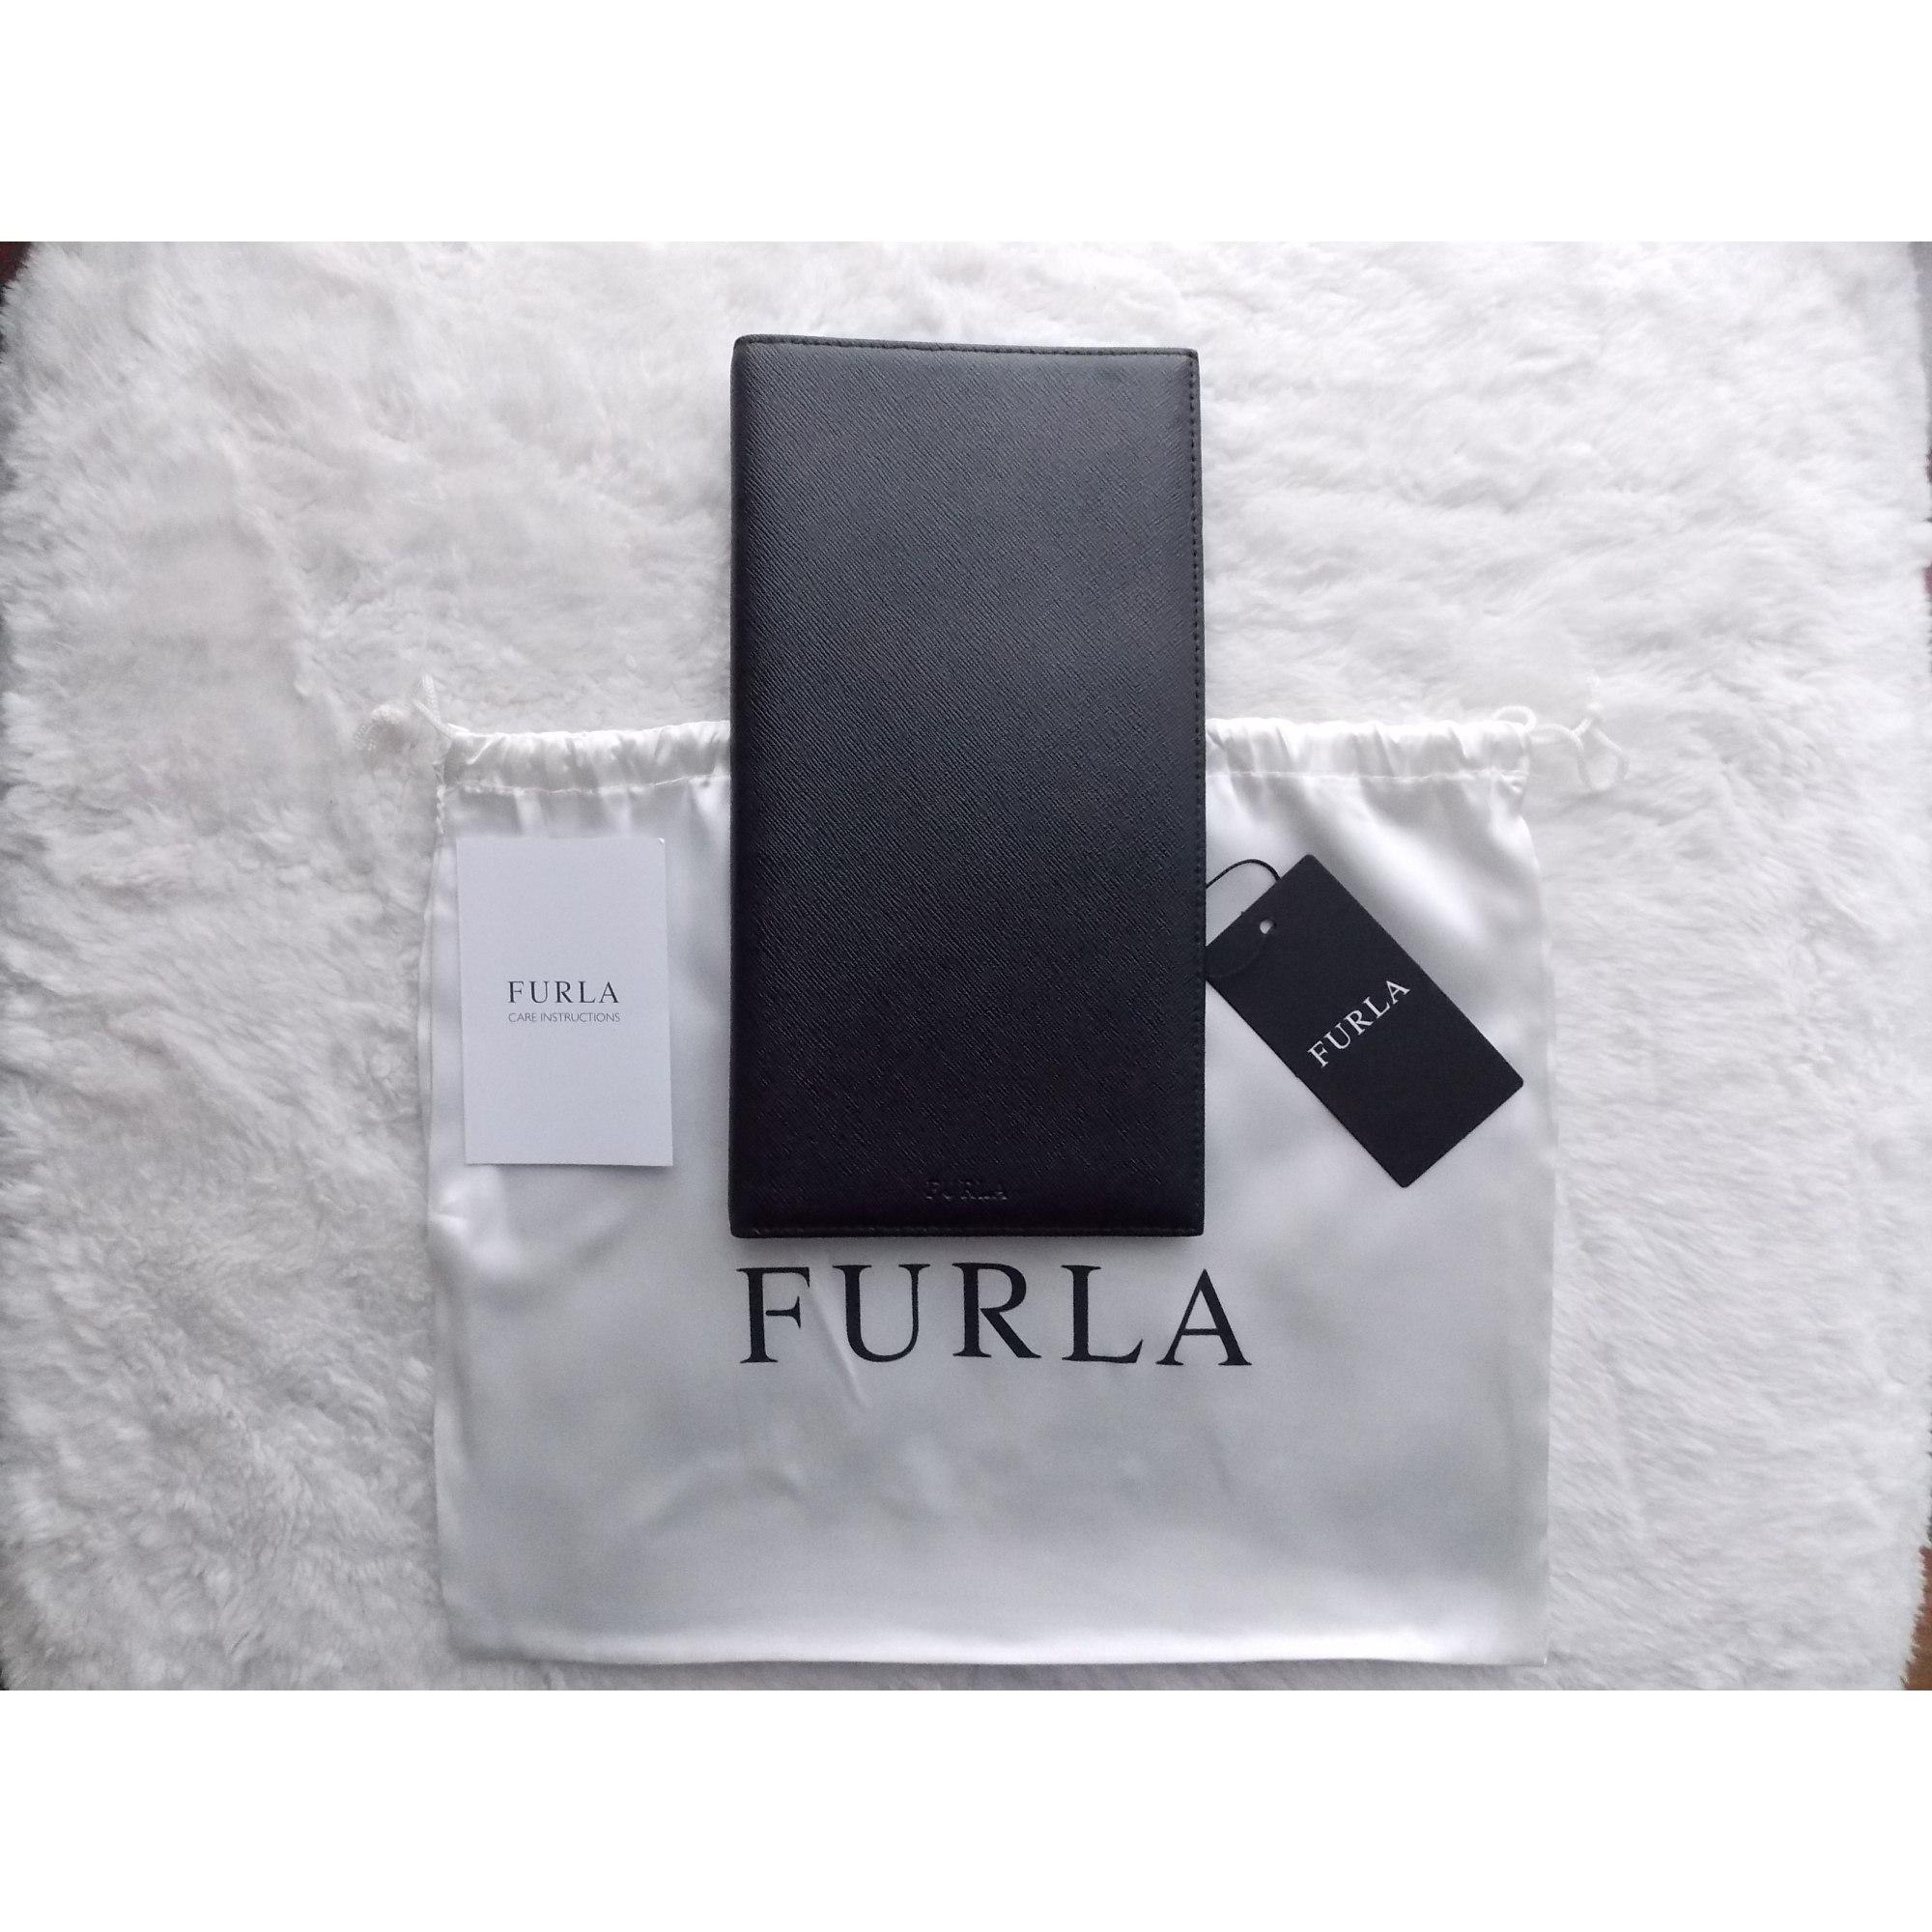 Porte-chéquier FURLA noir vendu par Nona65 - 5806858 1f78b5ff241